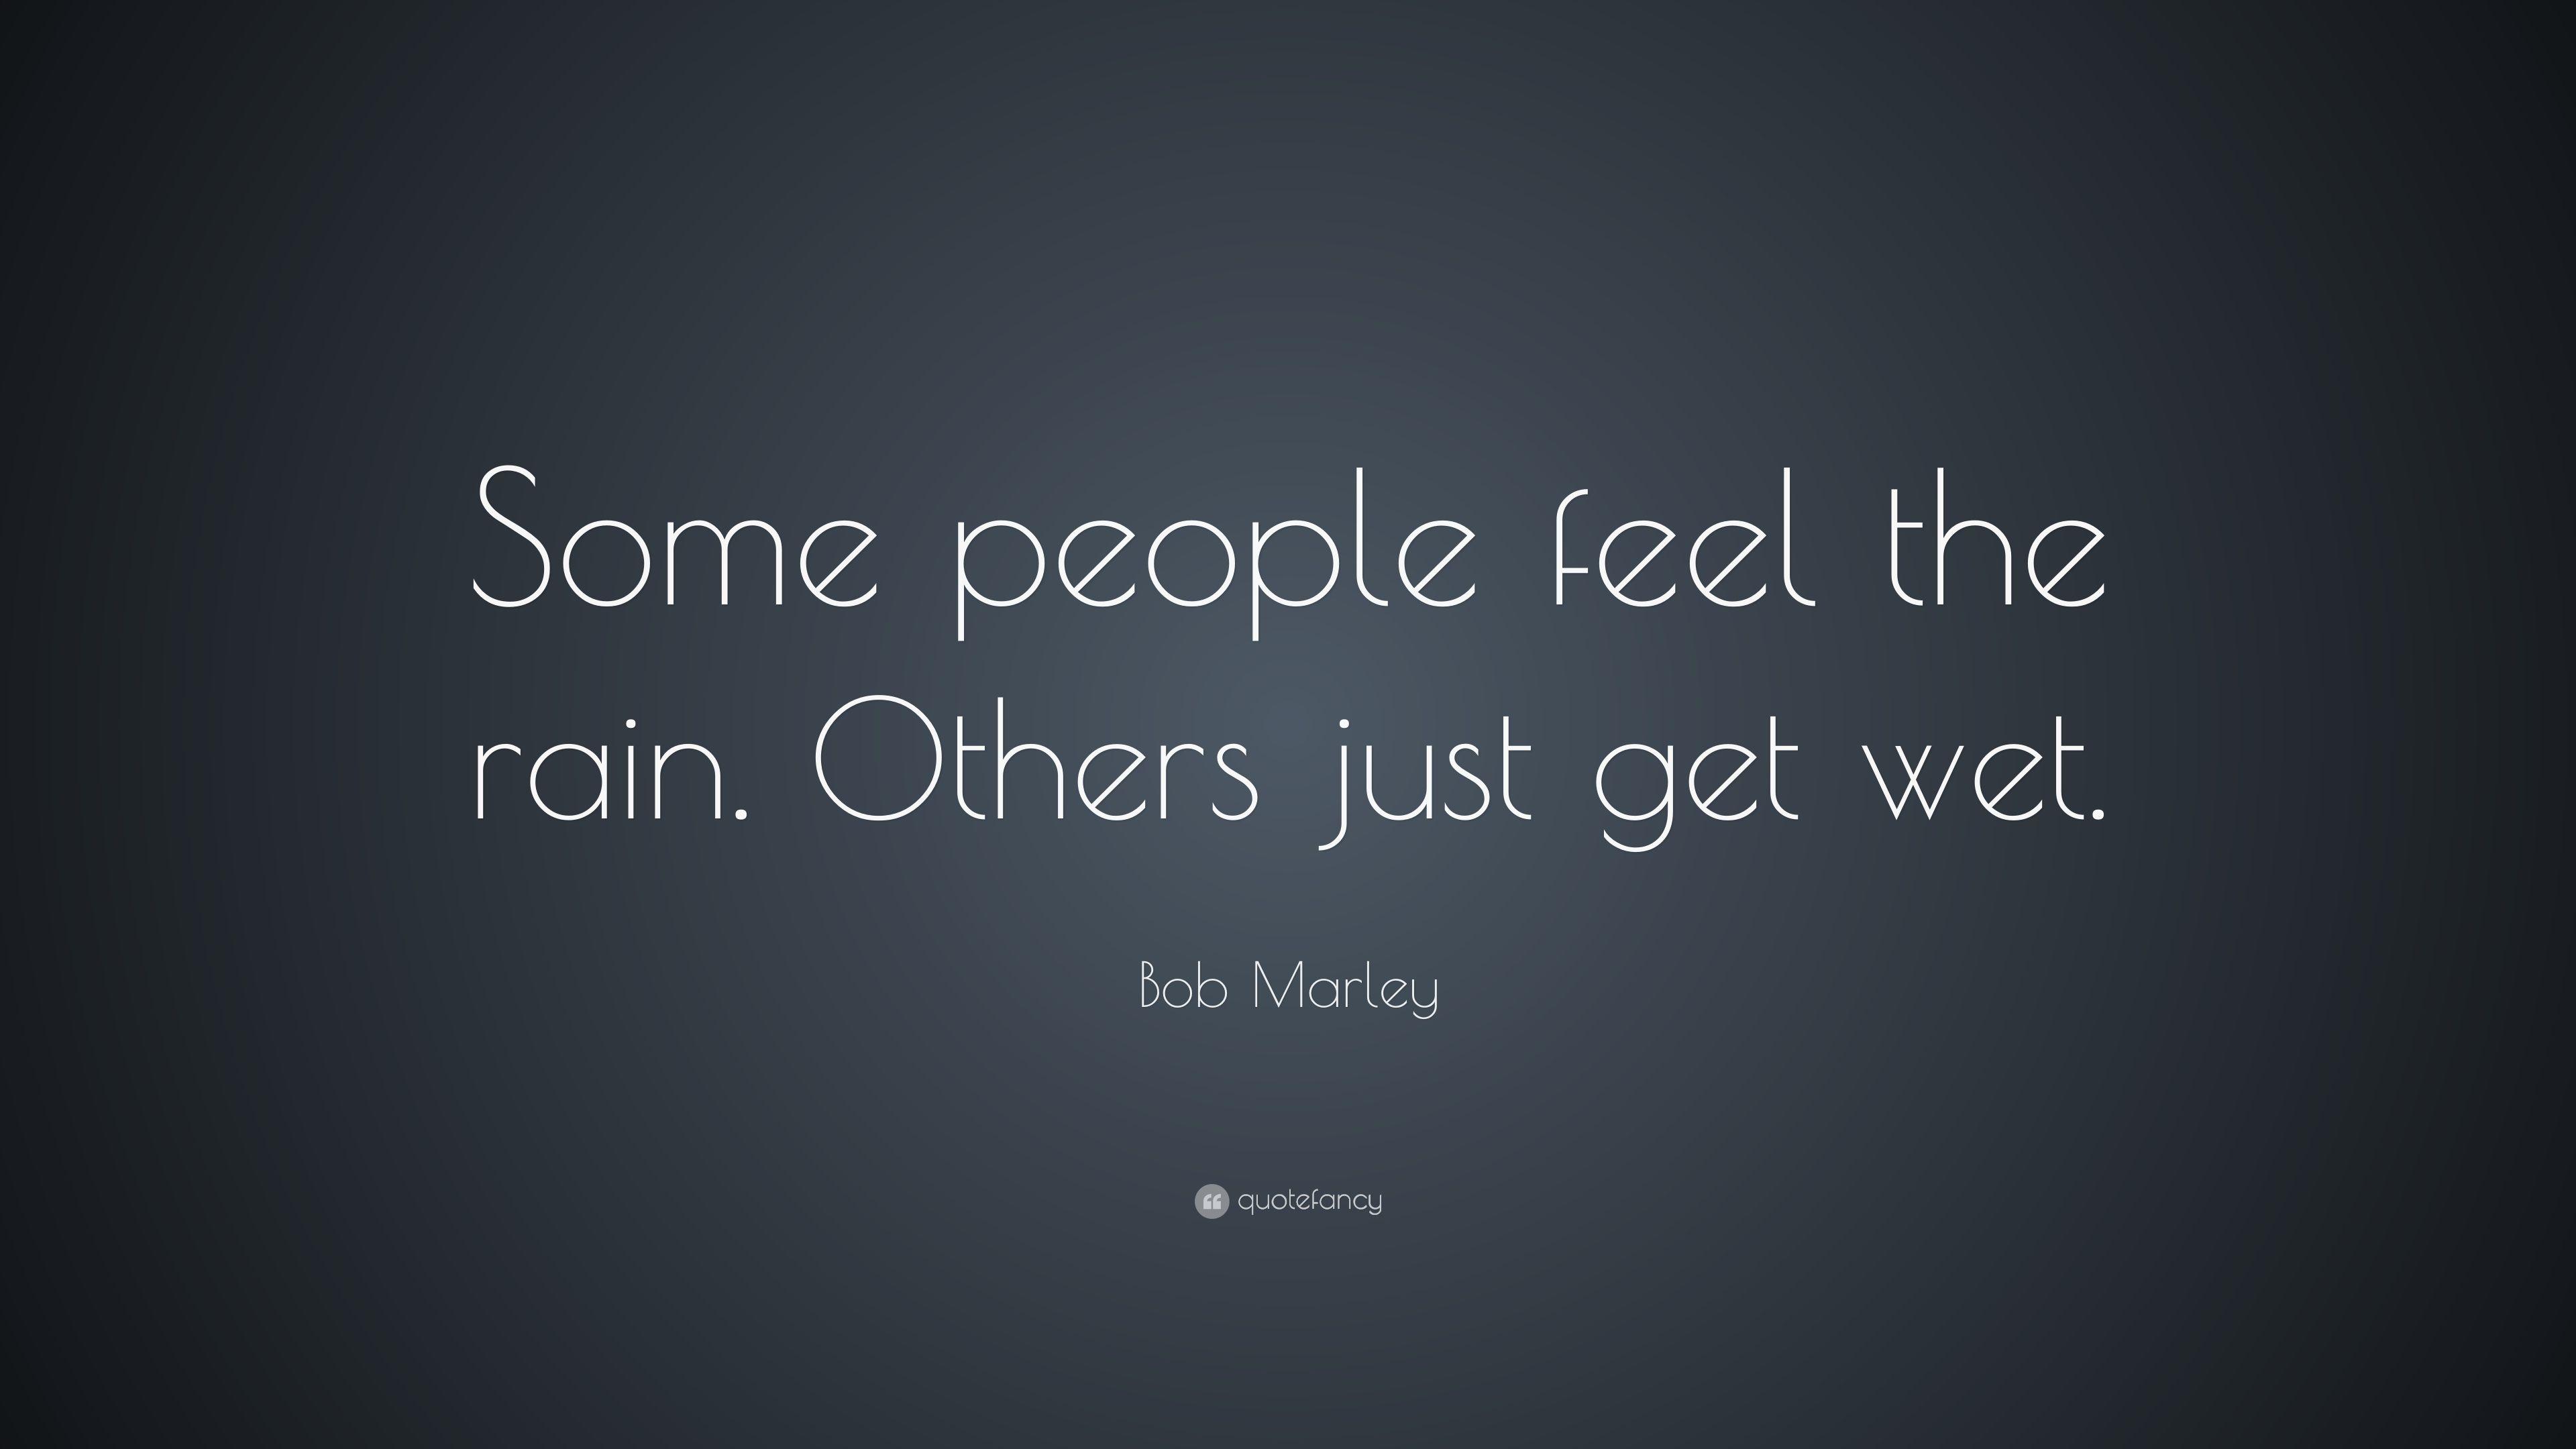 Men/'s Ladies T SHIRT Bob Marley quote Feel the Rain some people get wet hero